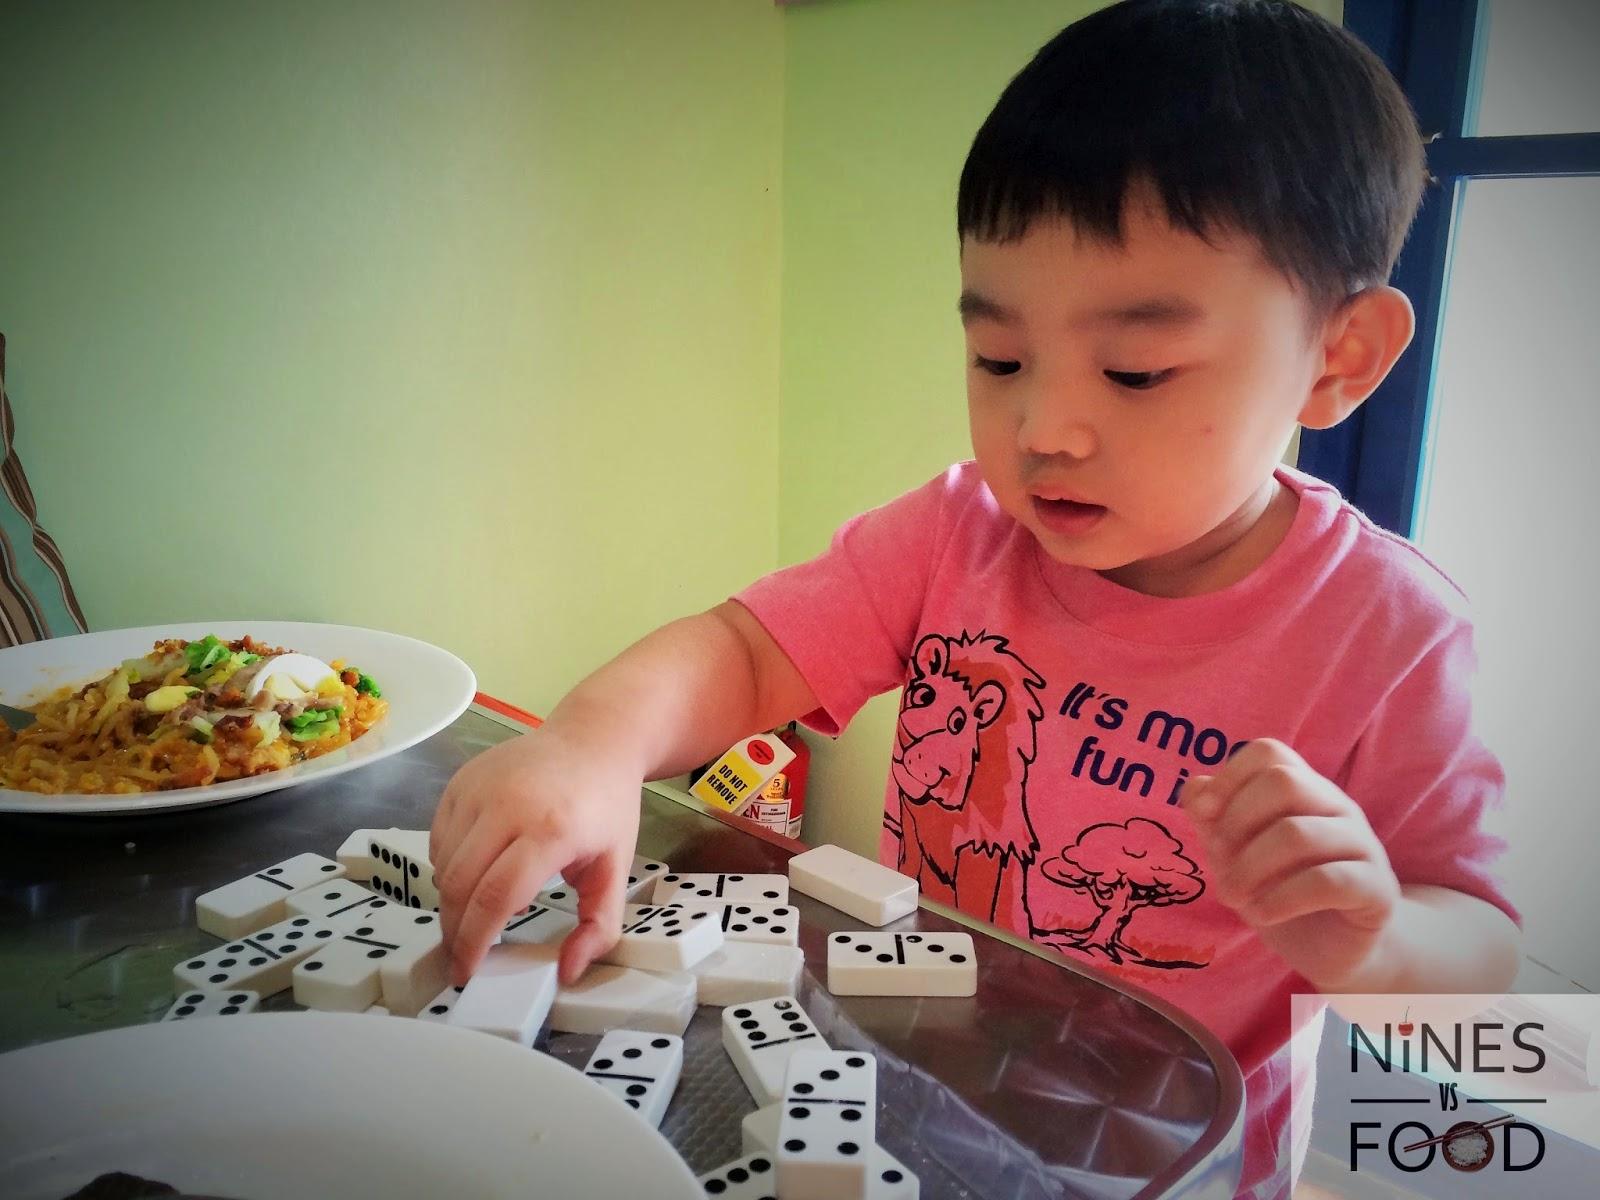 Nines vs. Food - Gabe's Home Kitchen-5.jpg